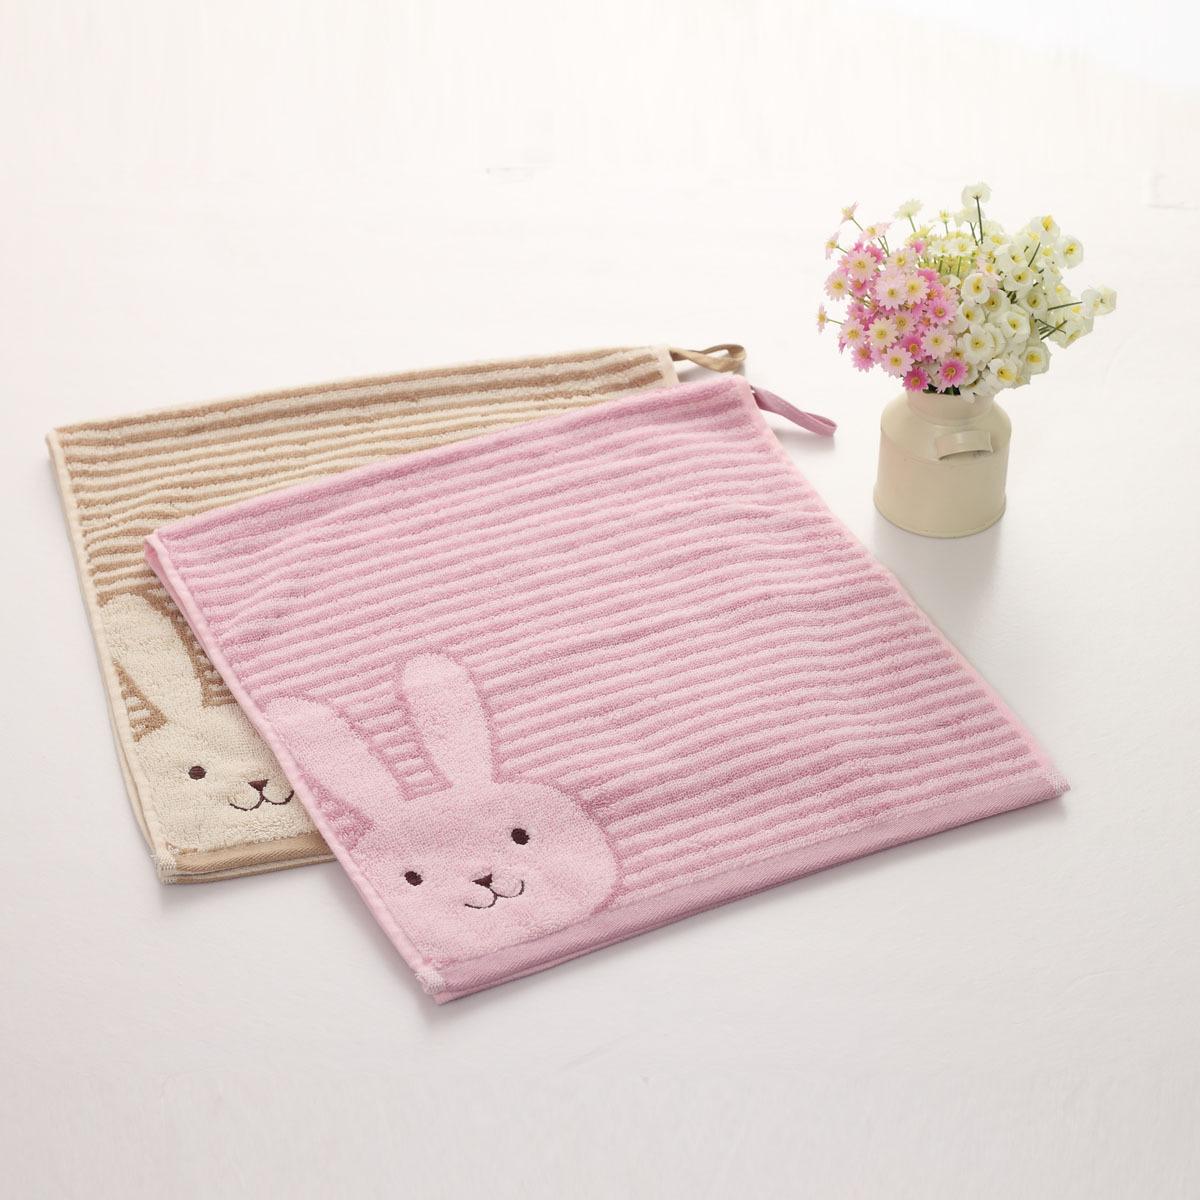 Vosges 100% cotton mention satin rabbit jy-1045b lovers bath towel(China (Mainland))